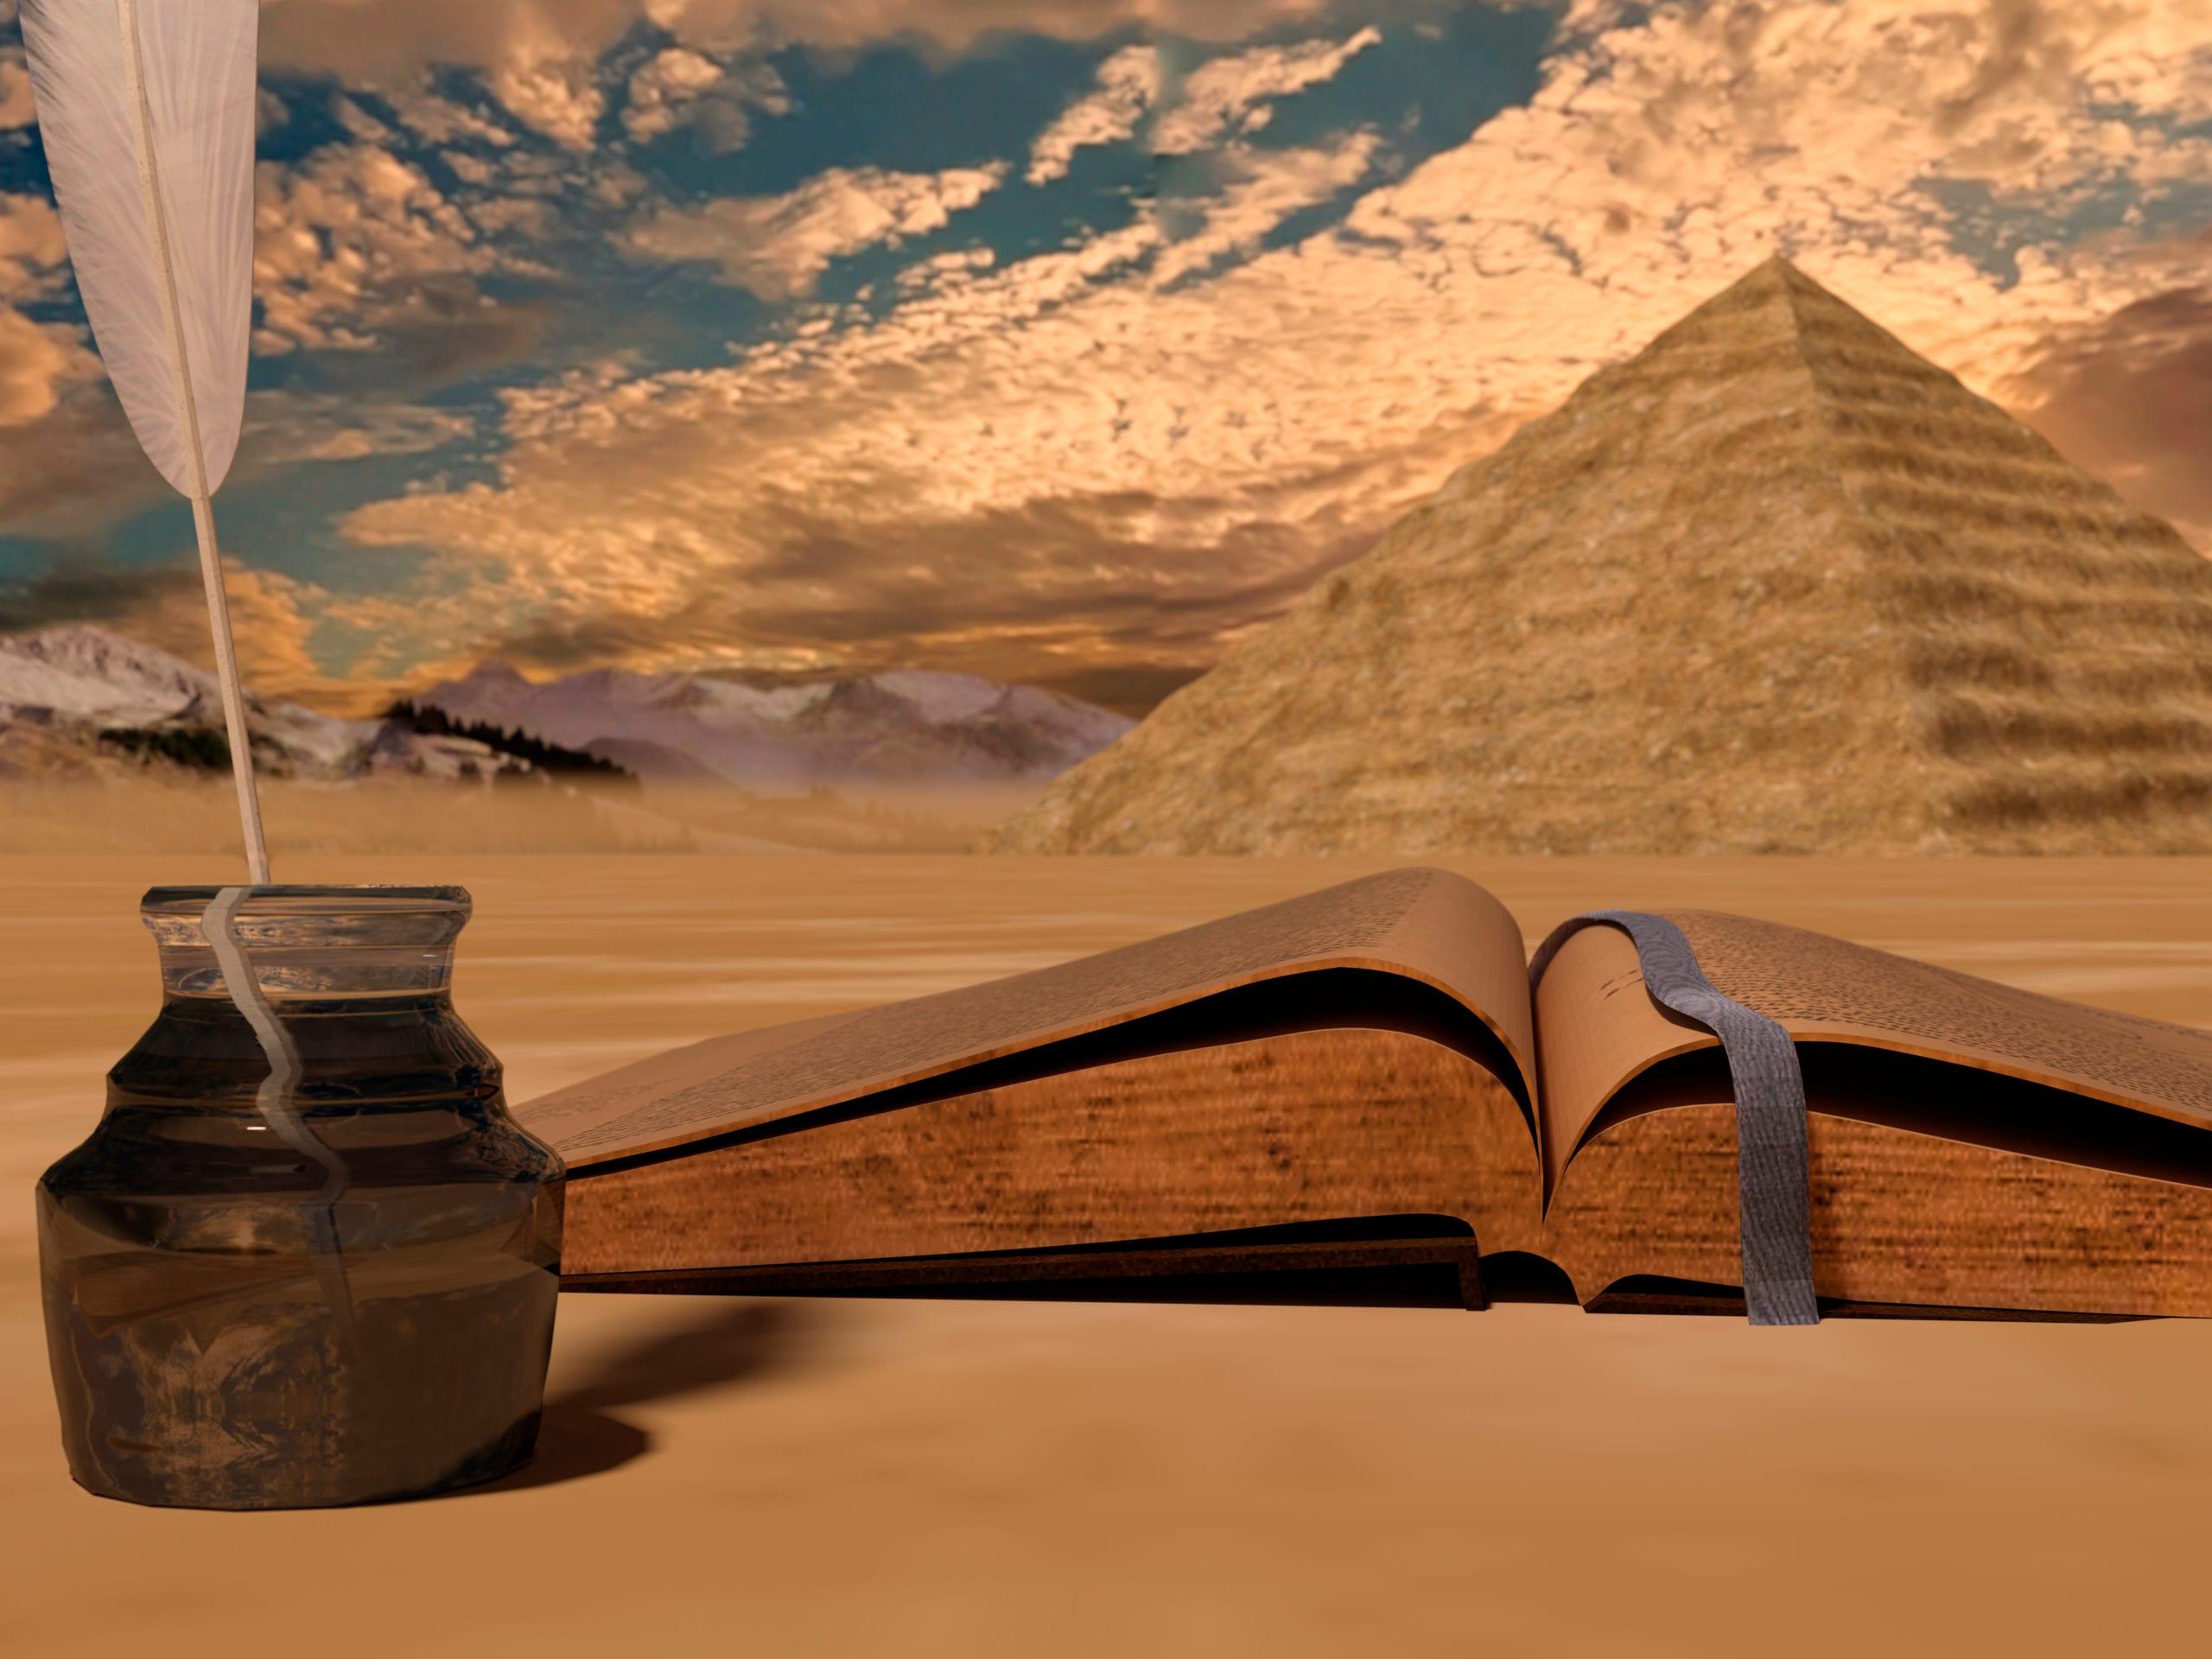 Did the Jews Build the Pyramids?